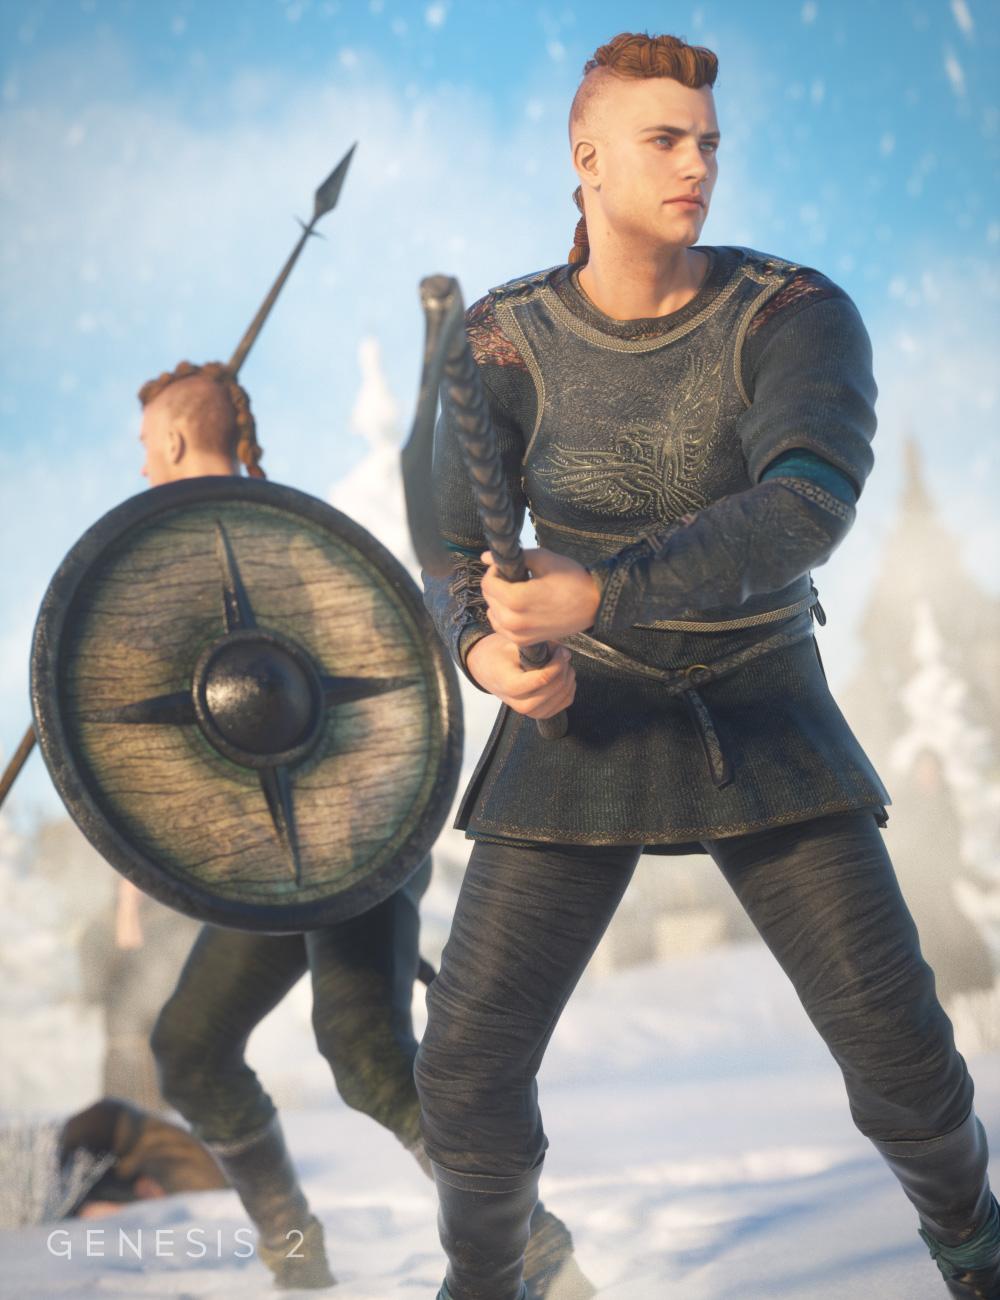 Norsemen II for Viking for Genesis 2 Male(s) by: Sarsa, 3D Models by Daz 3D